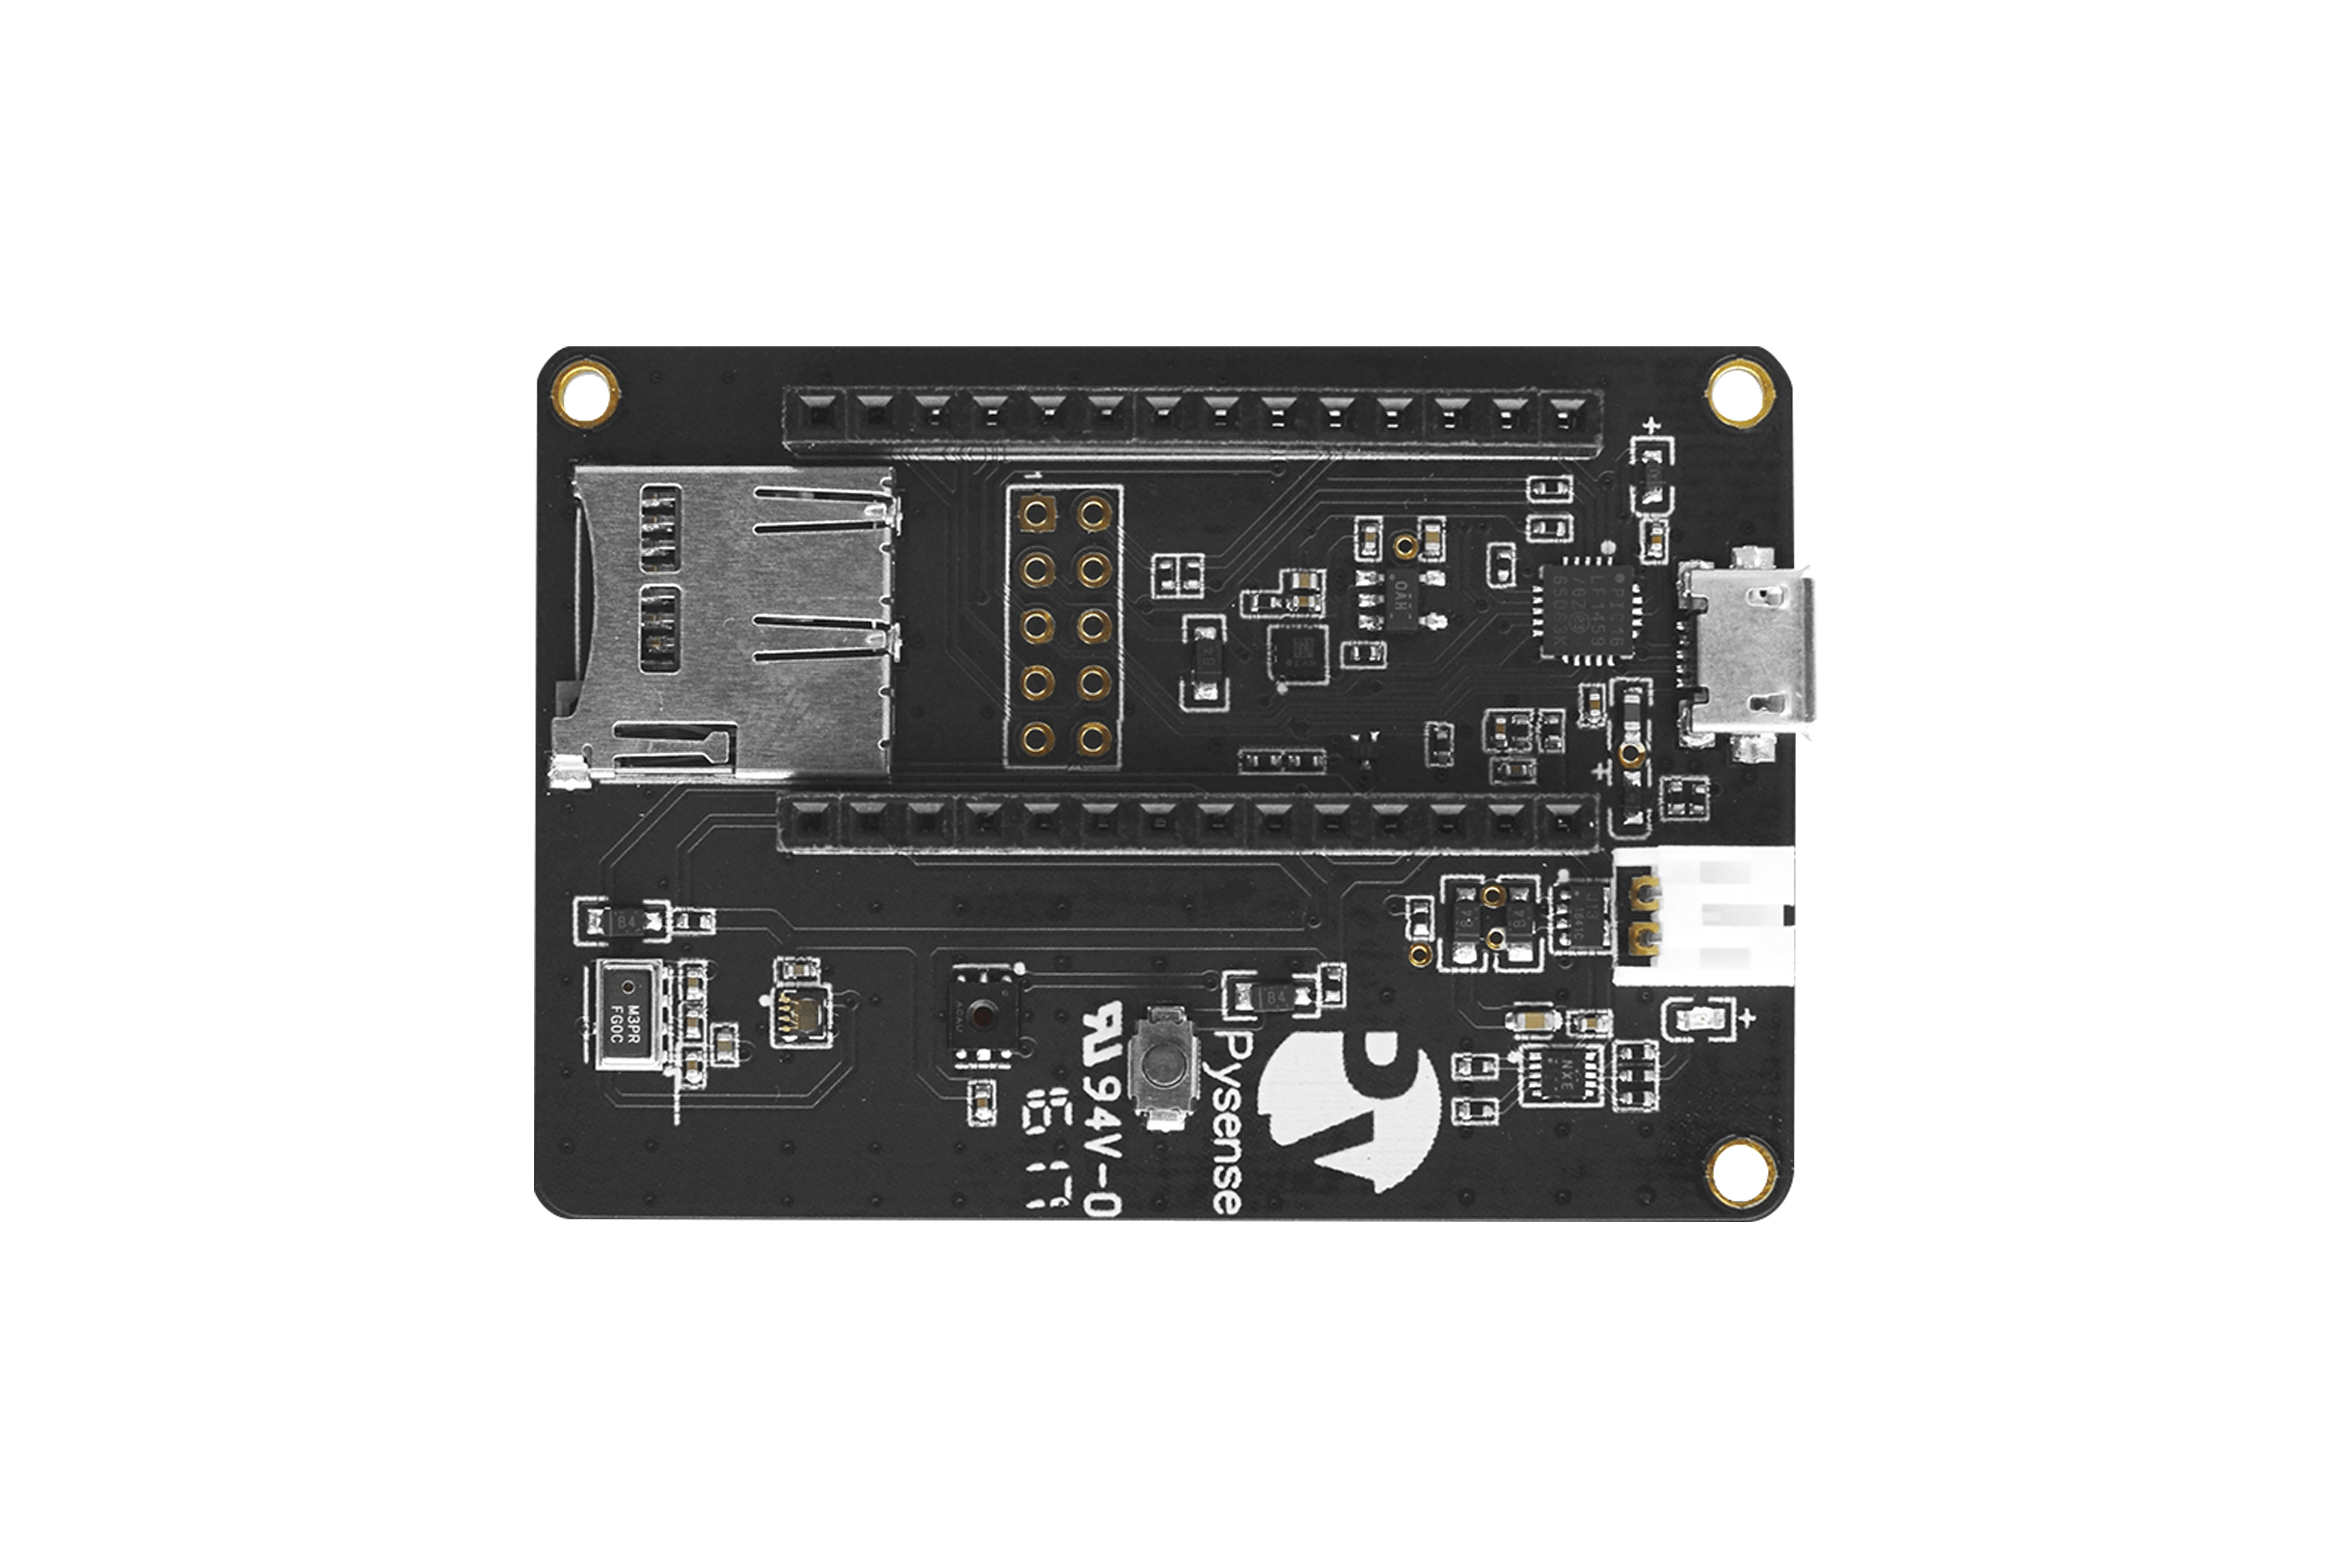 Pysense - sensor shield voor Pycom